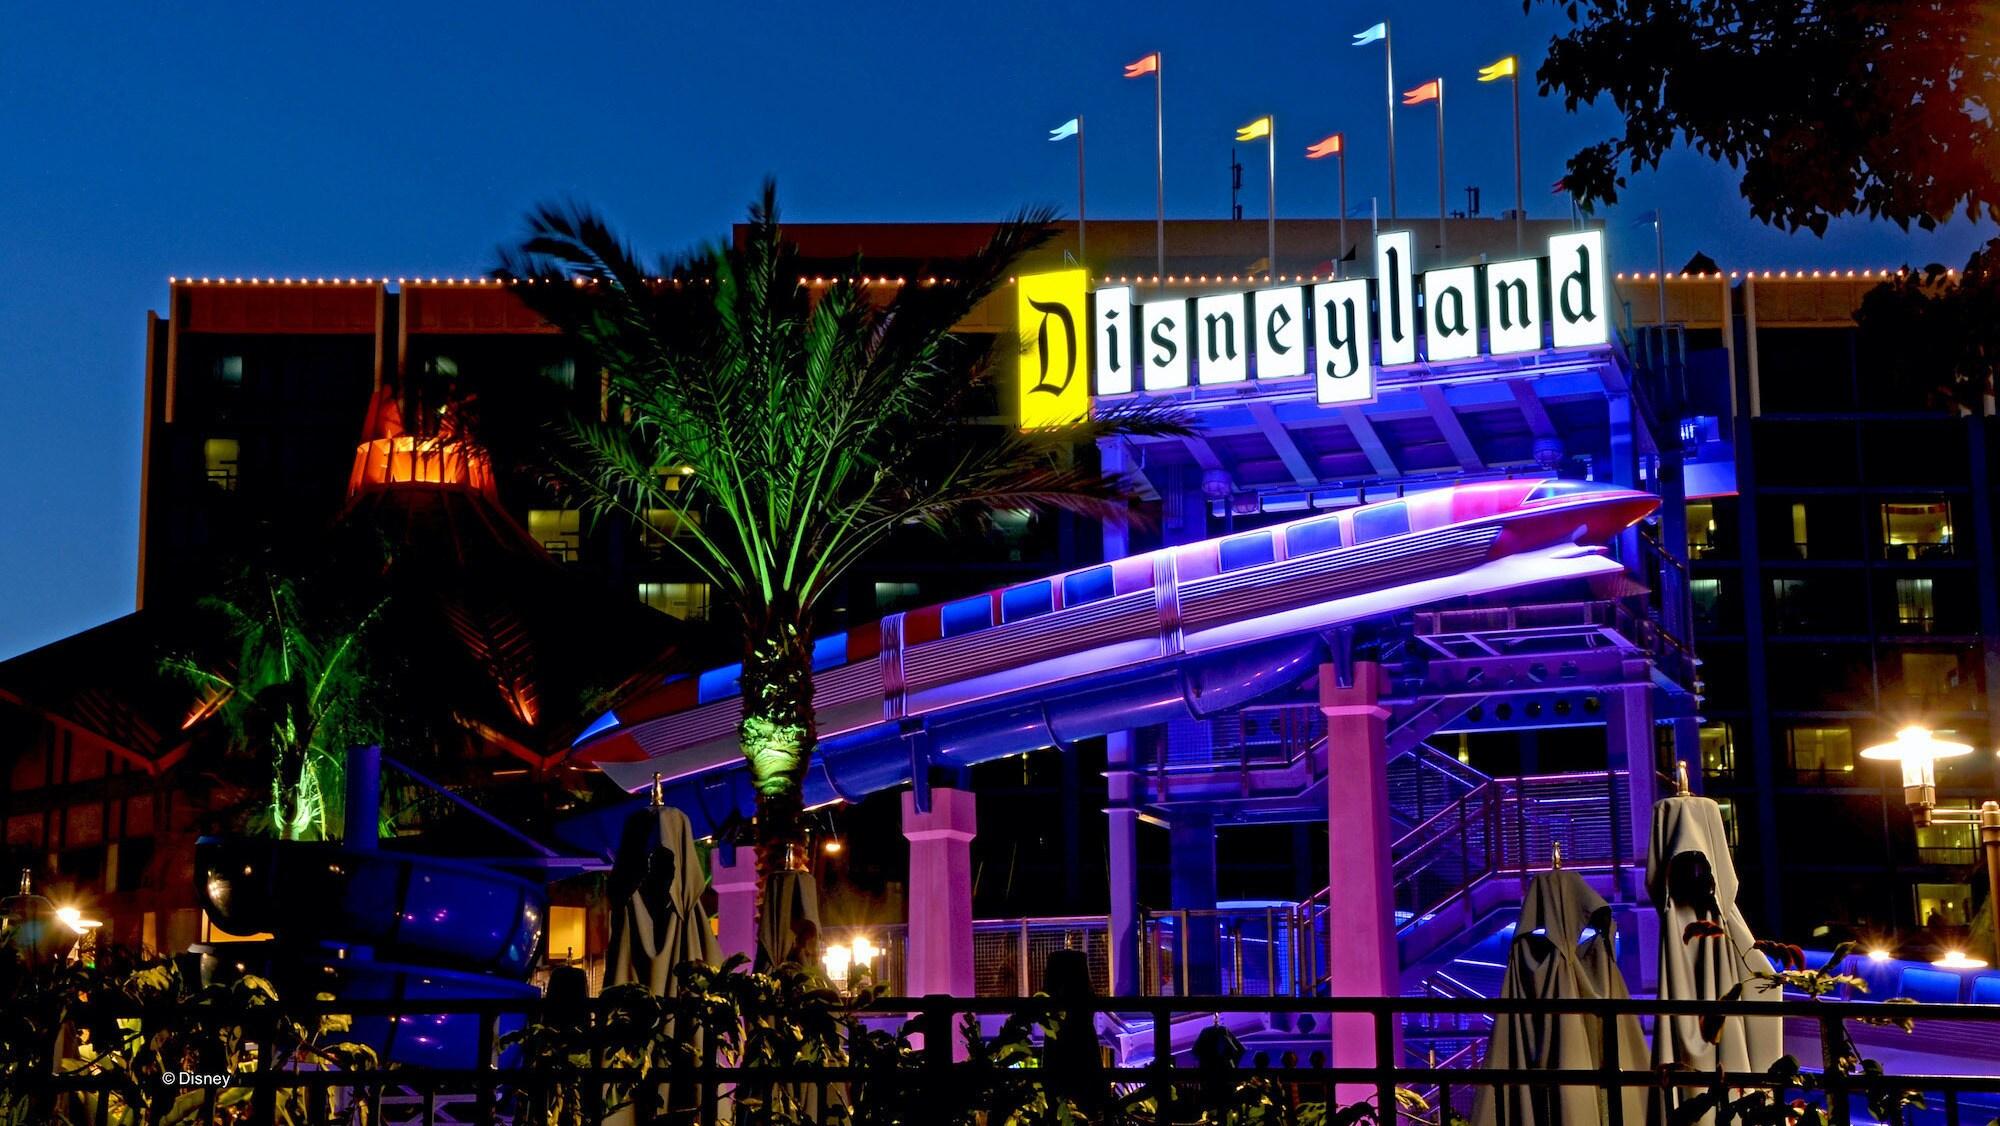 Image of the exterior Disneyland hotel at night.